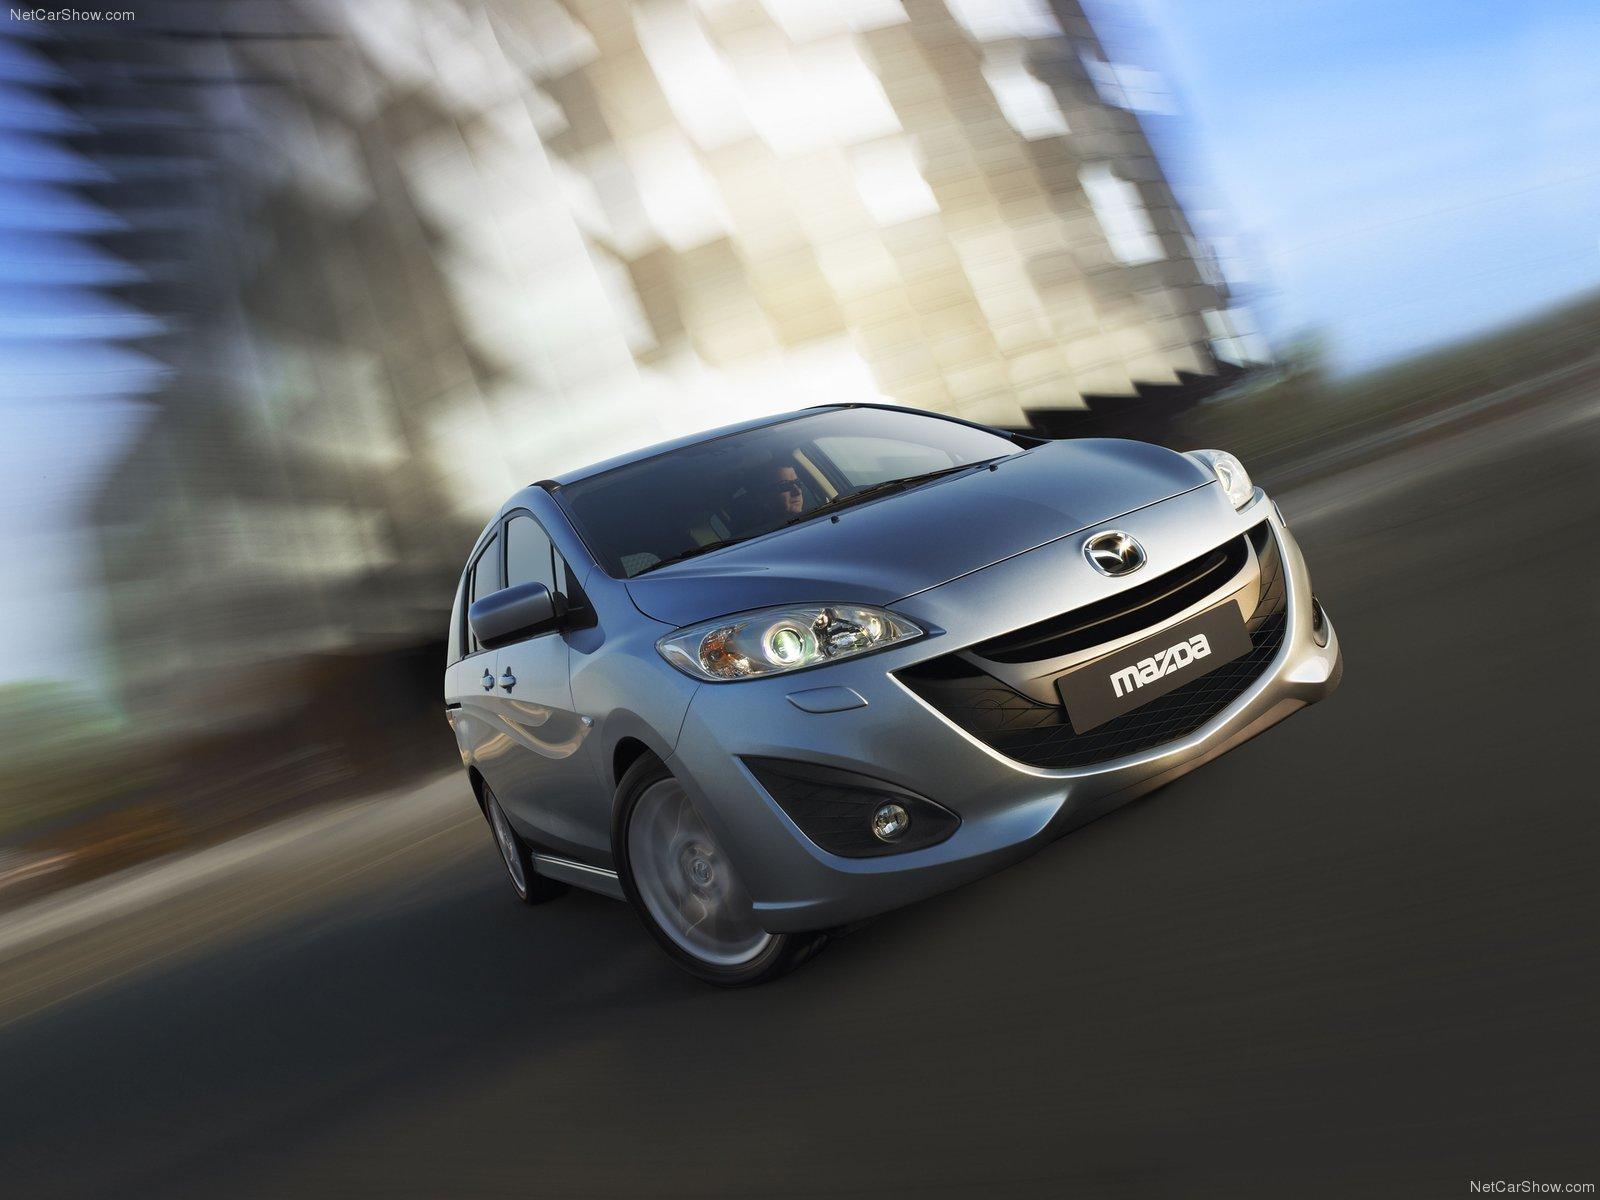 http://3.bp.blogspot.com/_D5hgPjGJZ54/TDePV85GIOI/AAAAAAAADcI/qFnTvLrJy-M/s1600/Mazda-5_2011_1600x1200_wallpaper_01.jpg